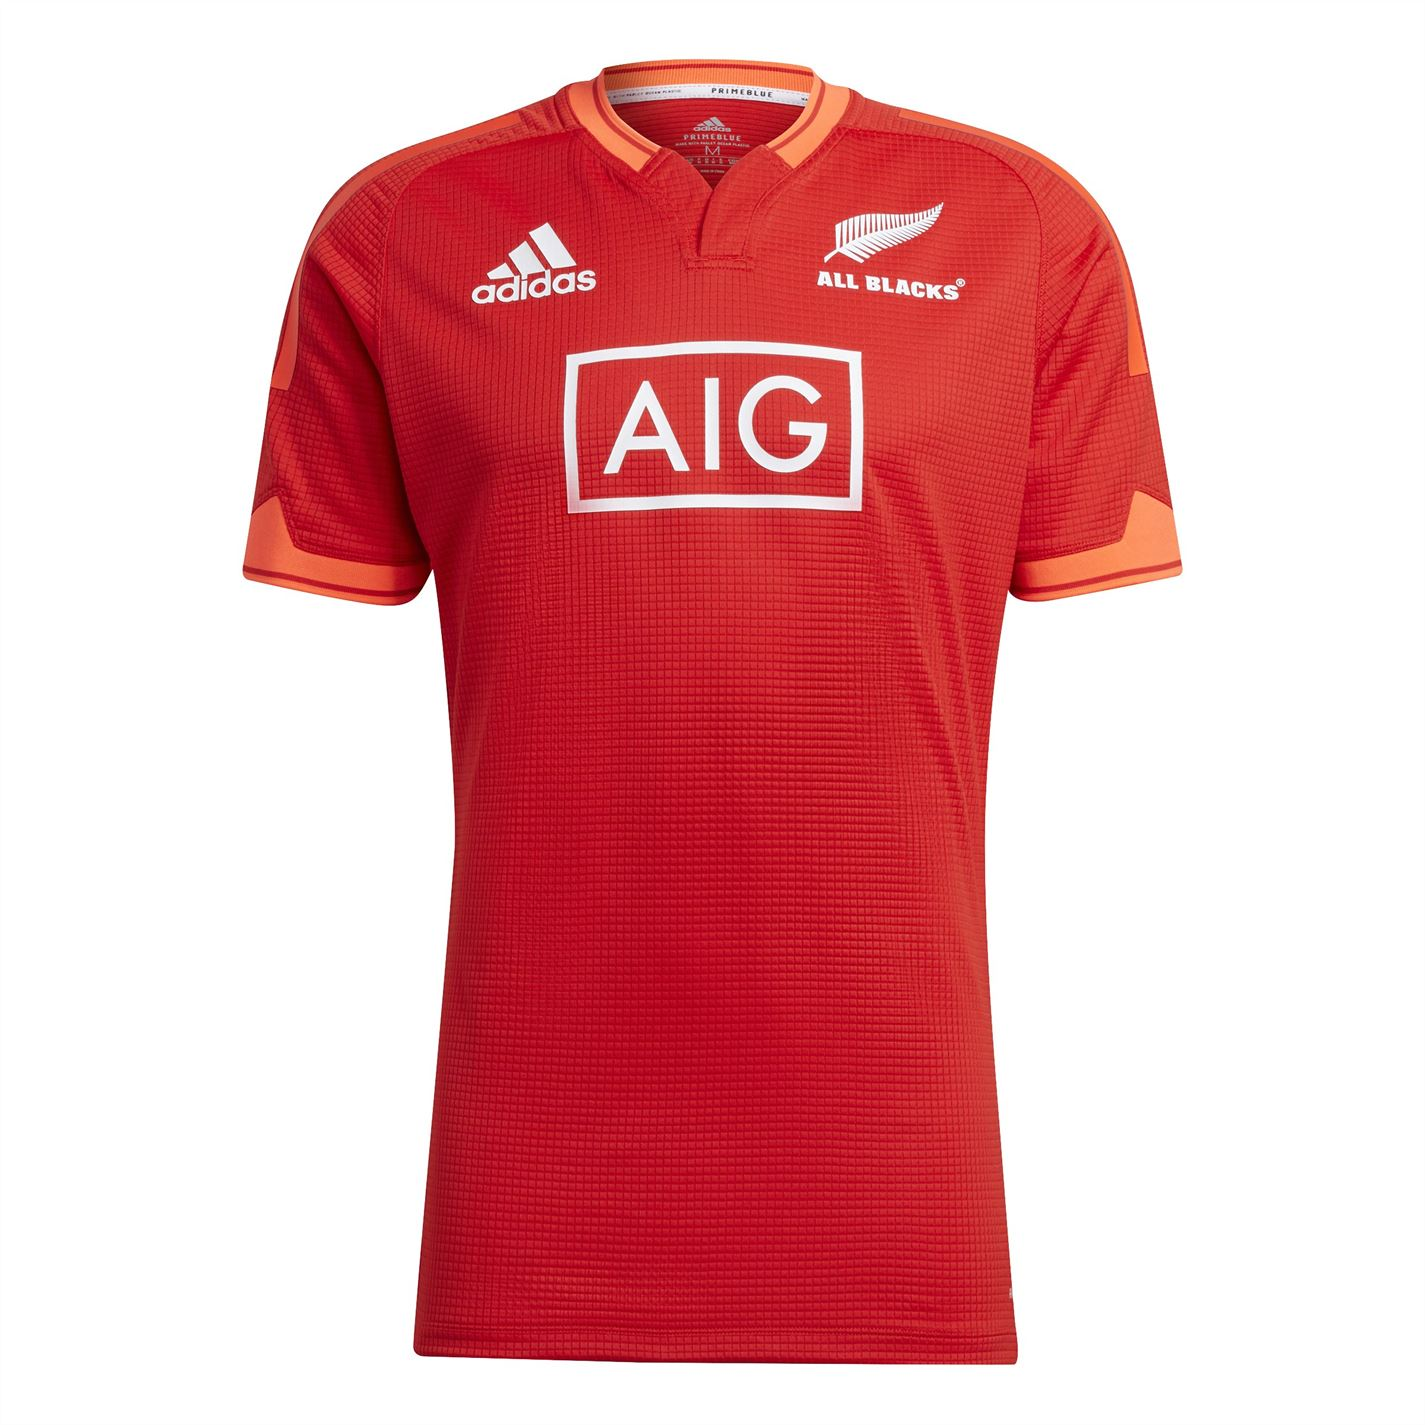 Tricou antrenement adidas New Zealand Rugby All Blacks pentru Barbati rosu apsord alb